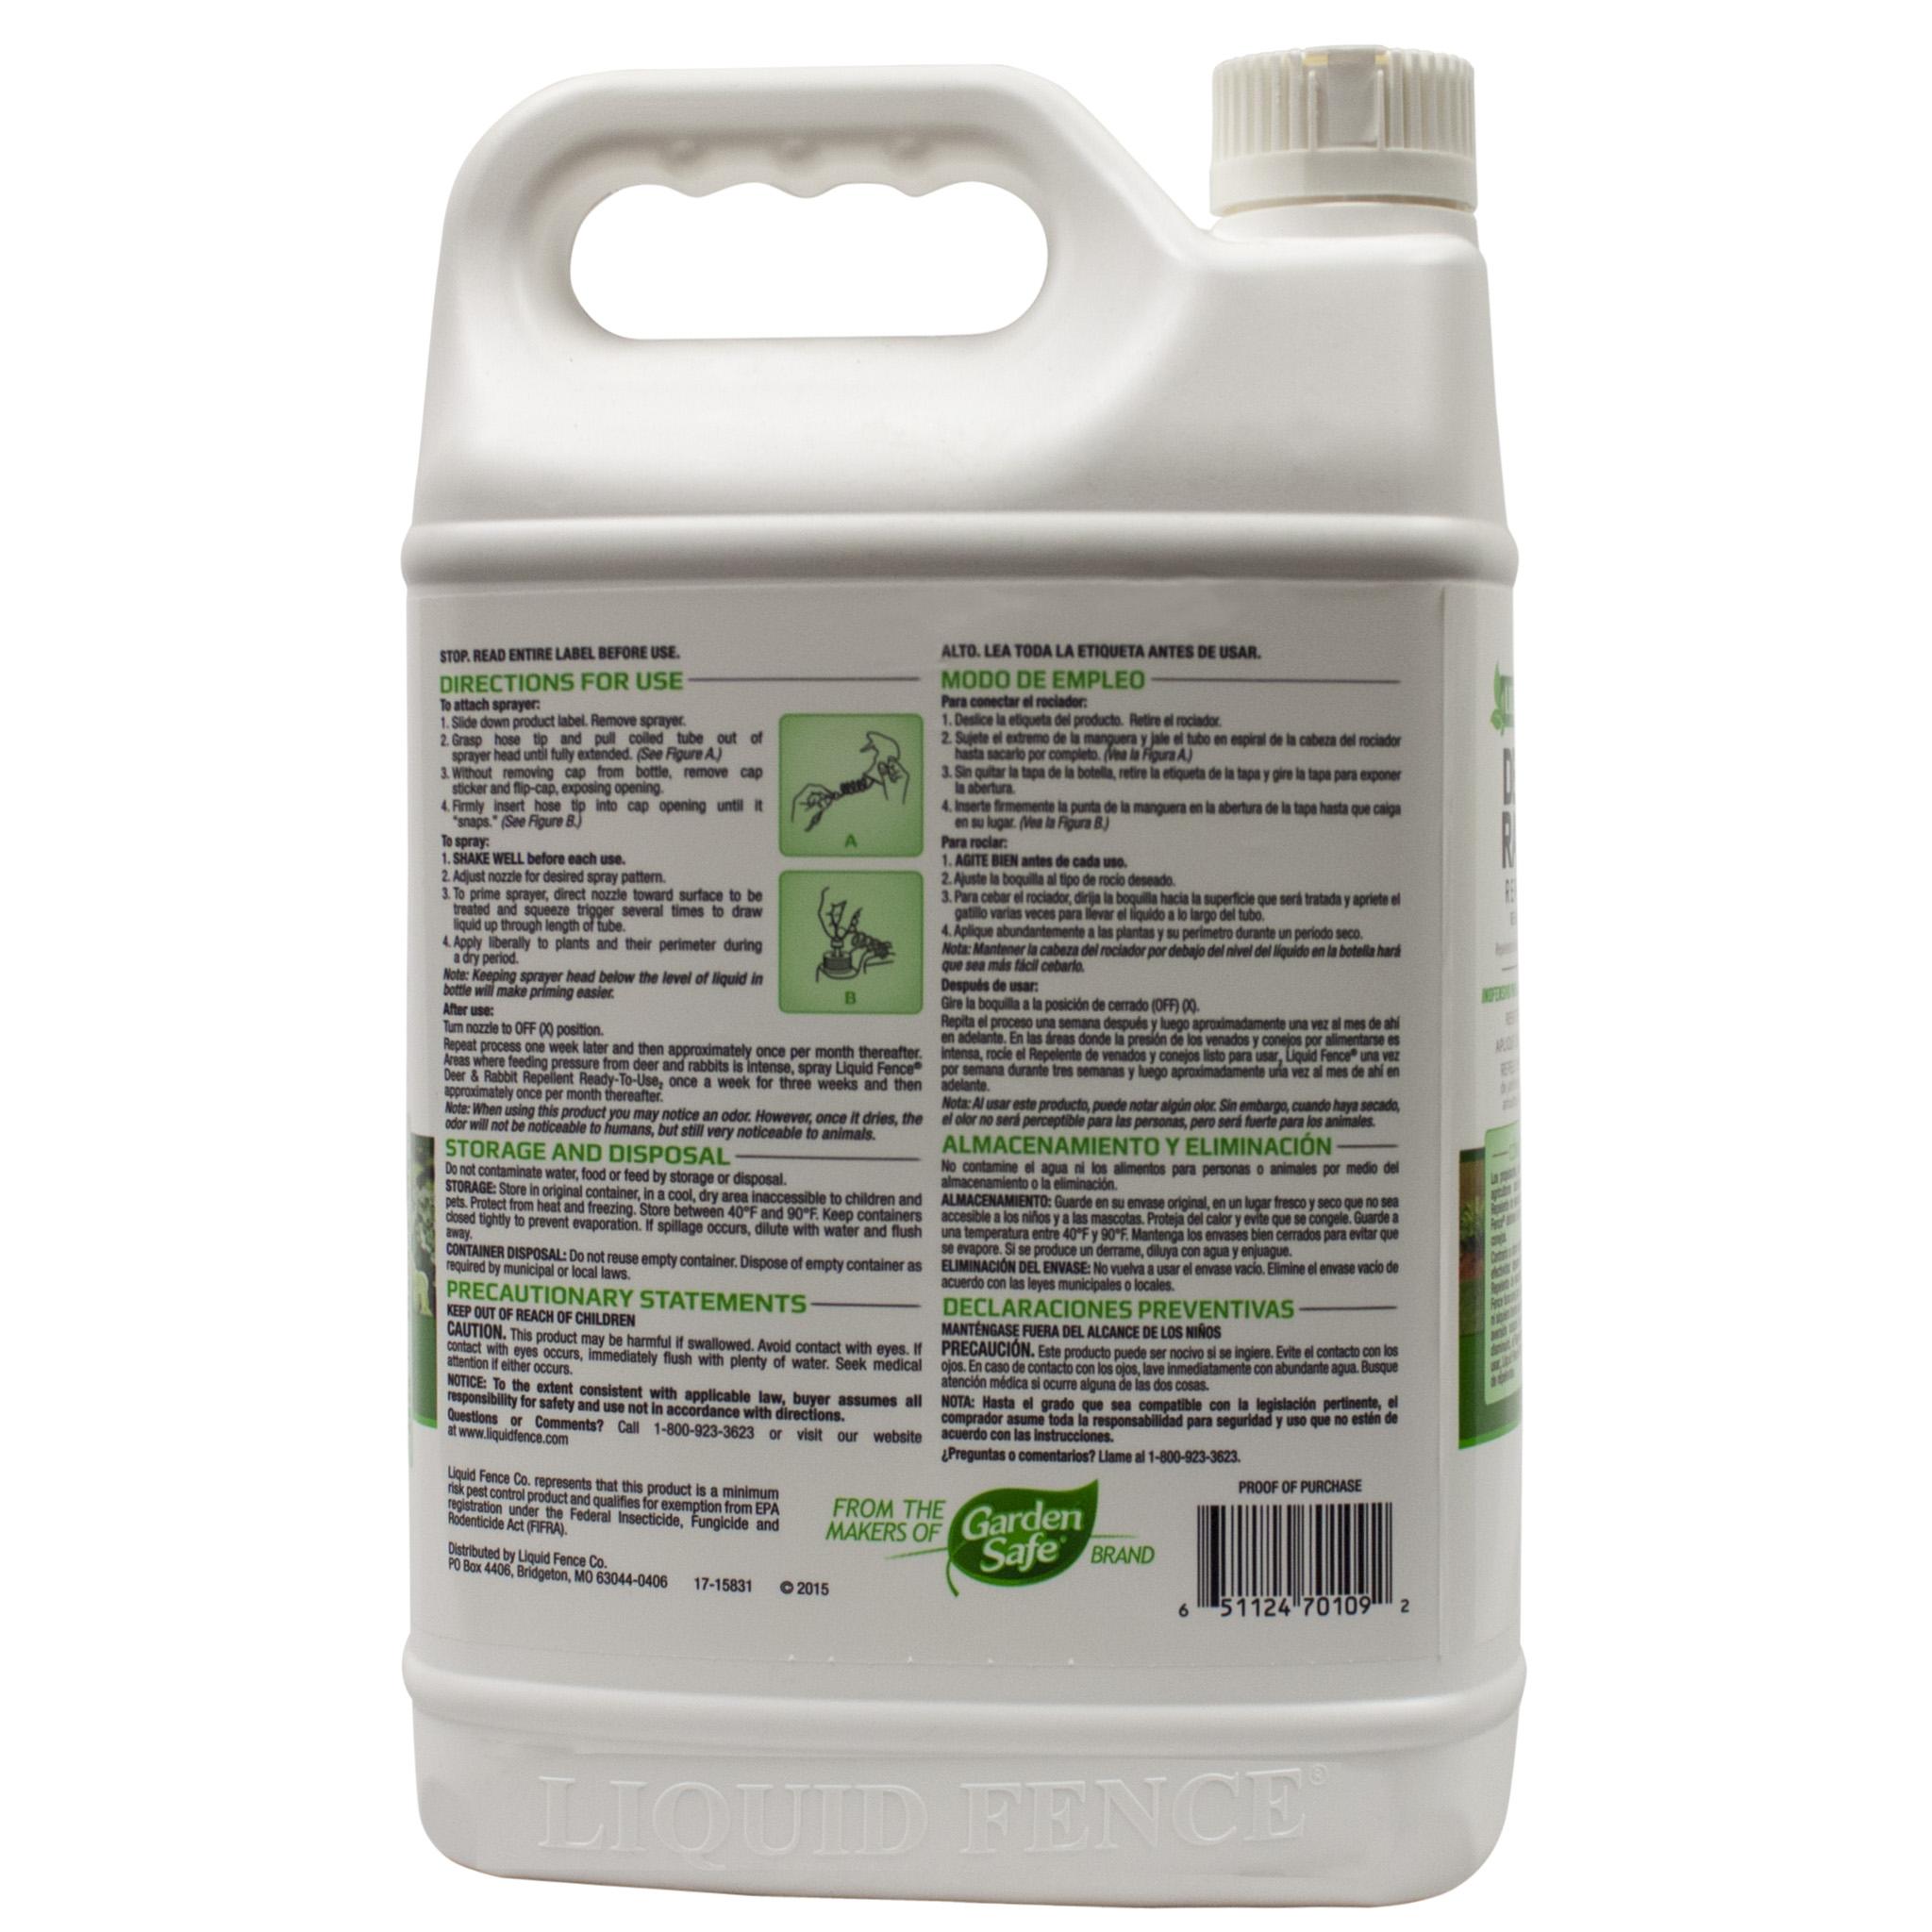 Liquid Fence Deer Rabbit Repellent RTU 109 1 Gallon Free Shipping